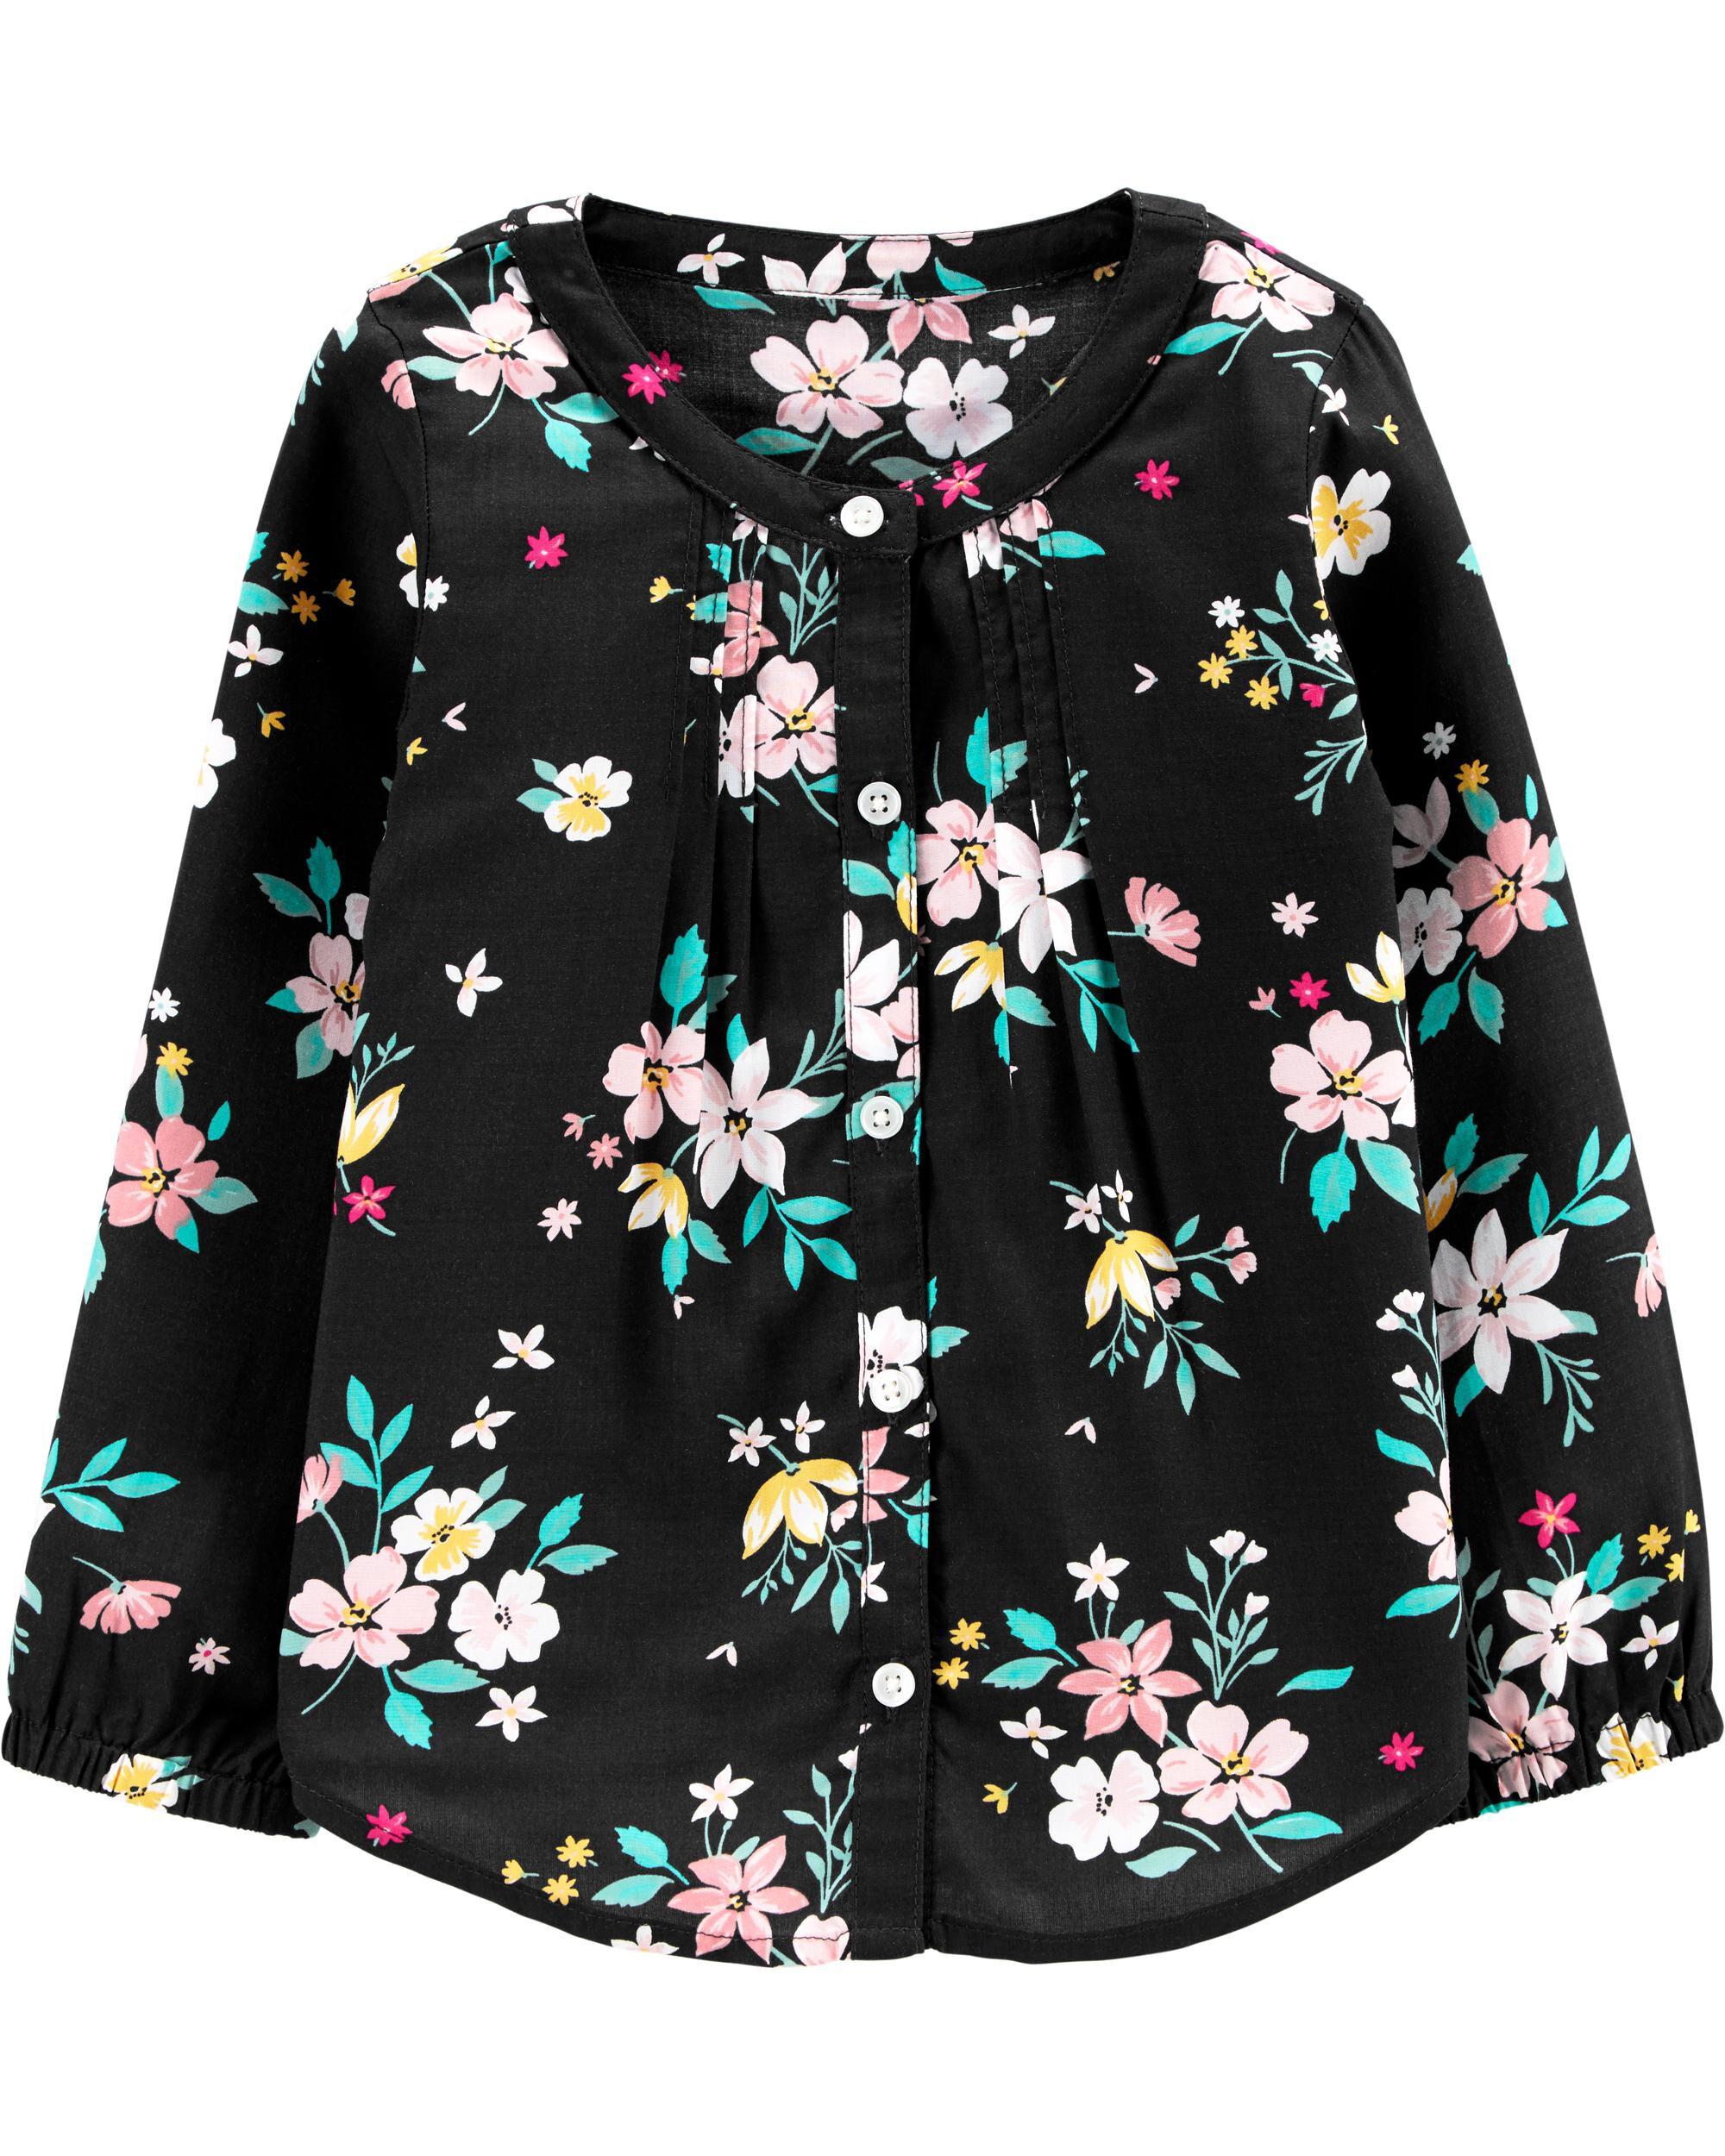 *CLEARANCE* Floral Poplin Top